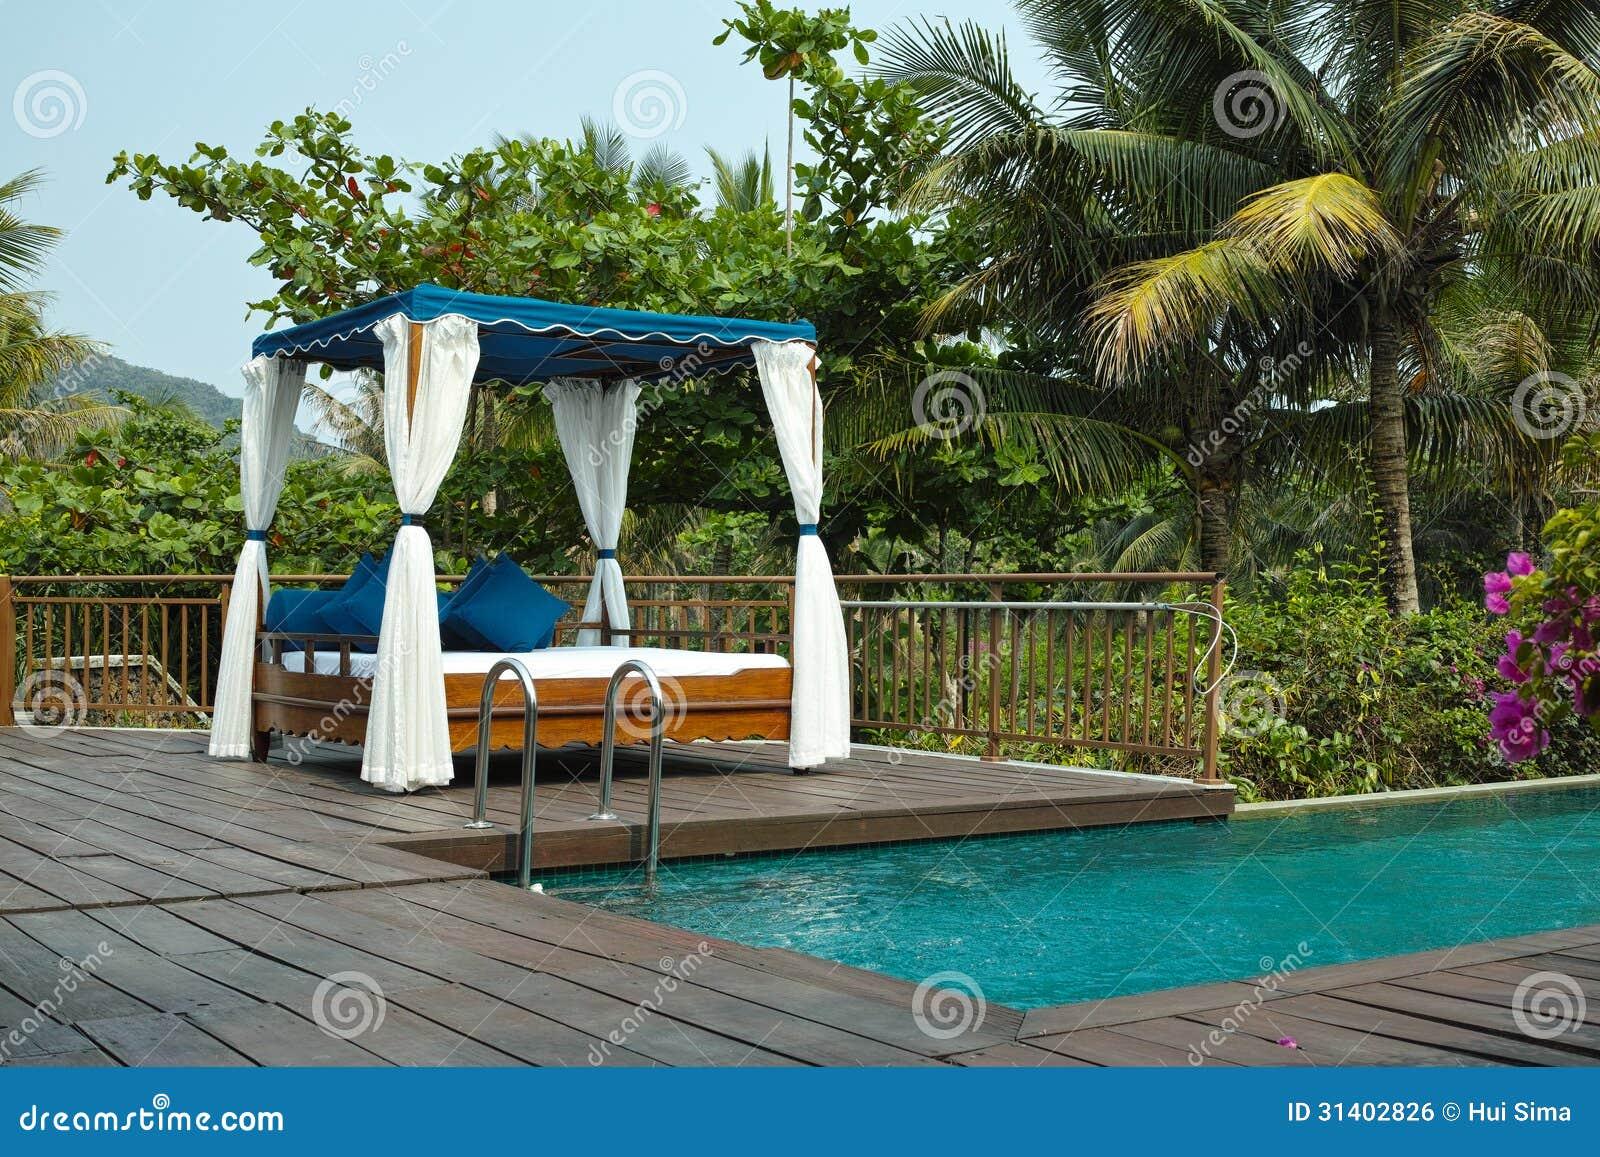 cabane et piscine tropicales photo stock image 31402826. Black Bedroom Furniture Sets. Home Design Ideas